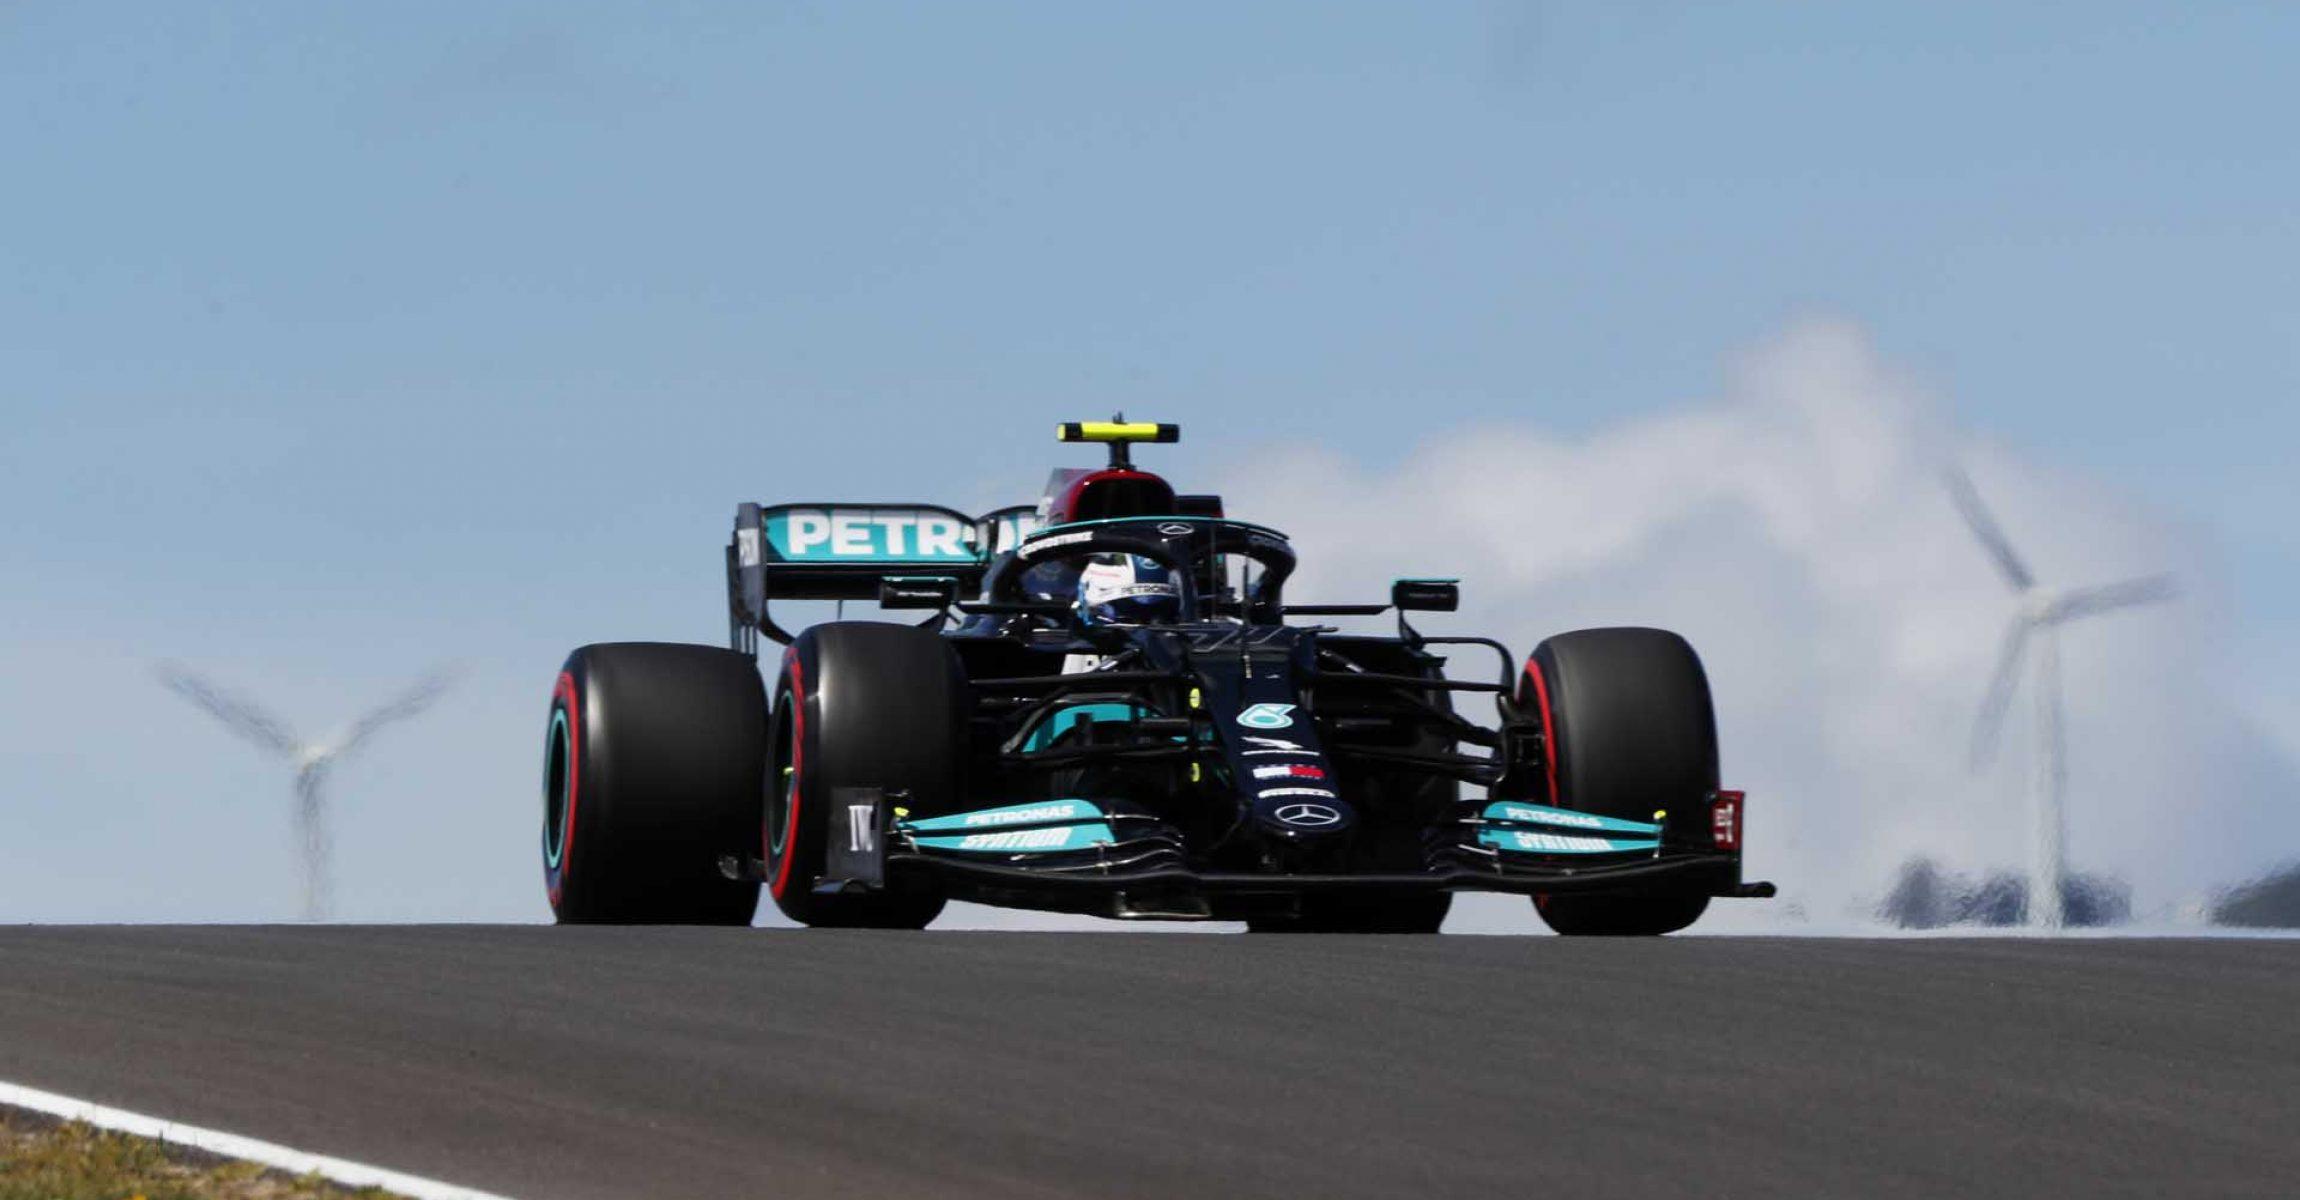 2021 Portuguese Grand Prix, Saturday - LAT Images